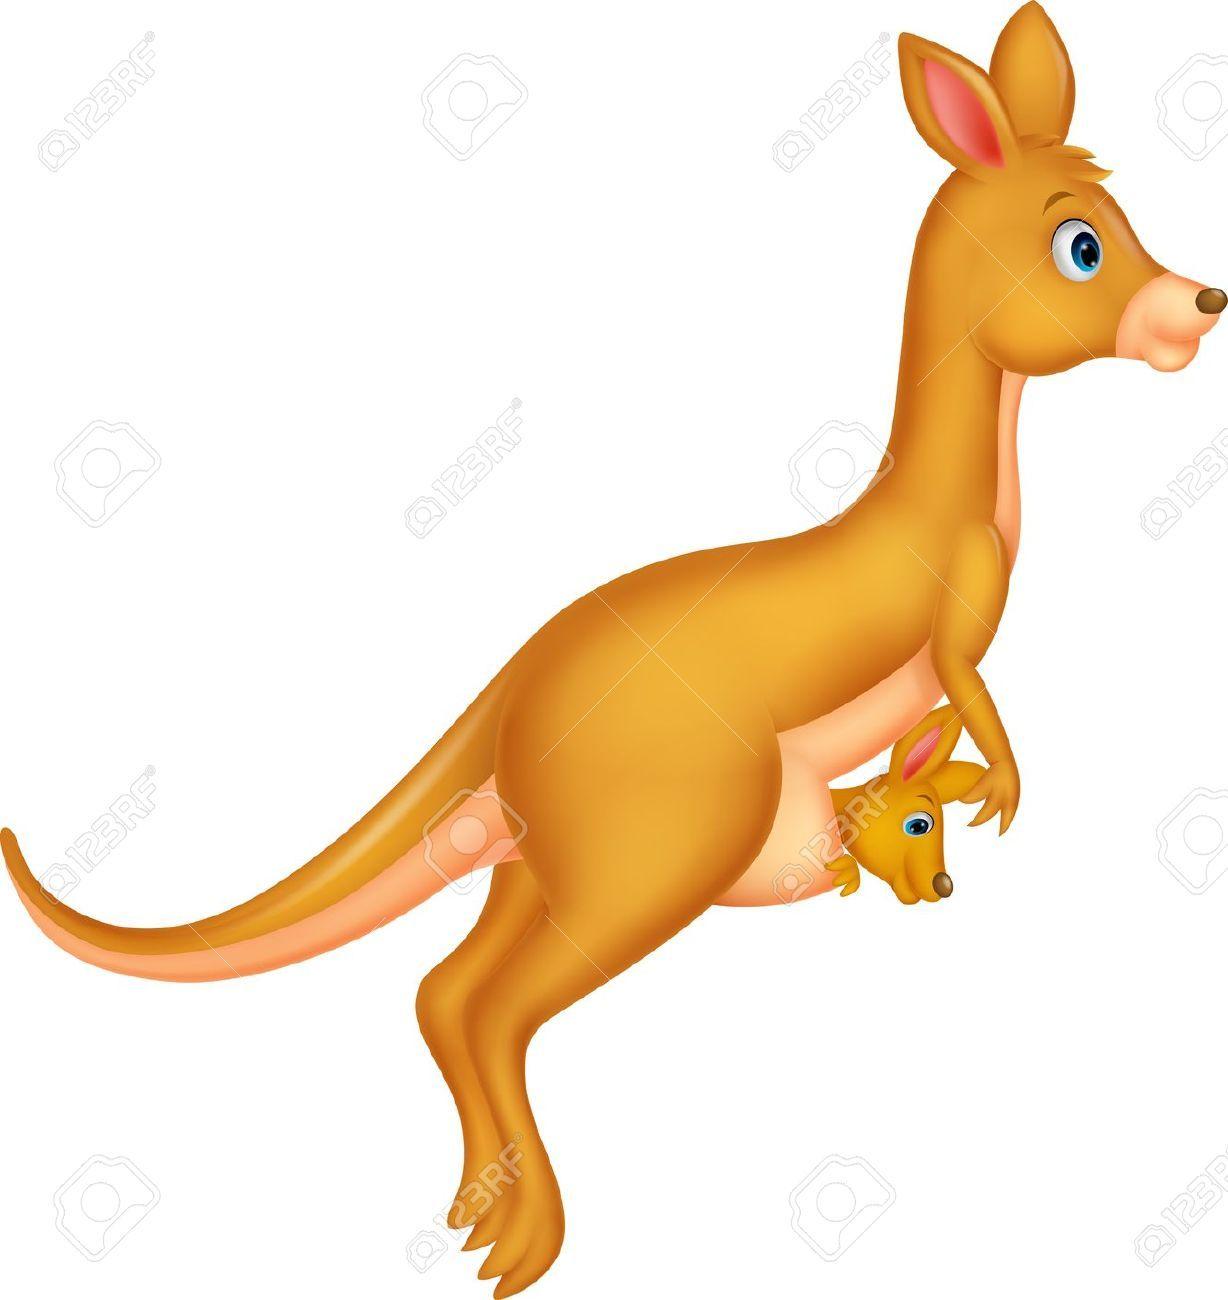 Jumping kangaroo clipart 1 » Clipart Portal.